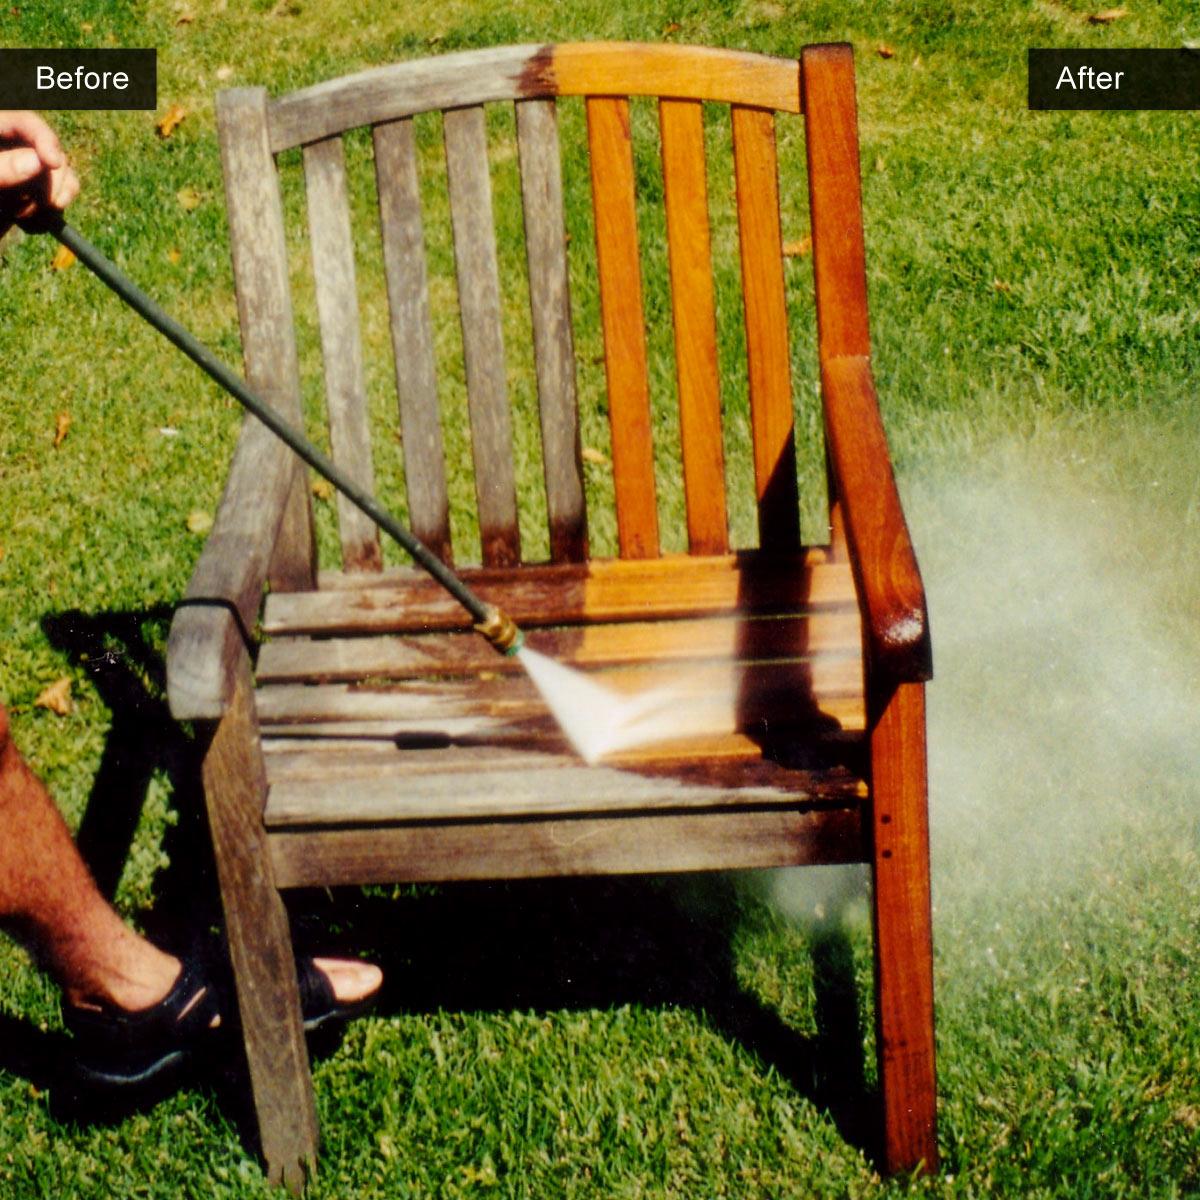 New Power Washed Teak Furniture Staining Teak Outdoor Furniture